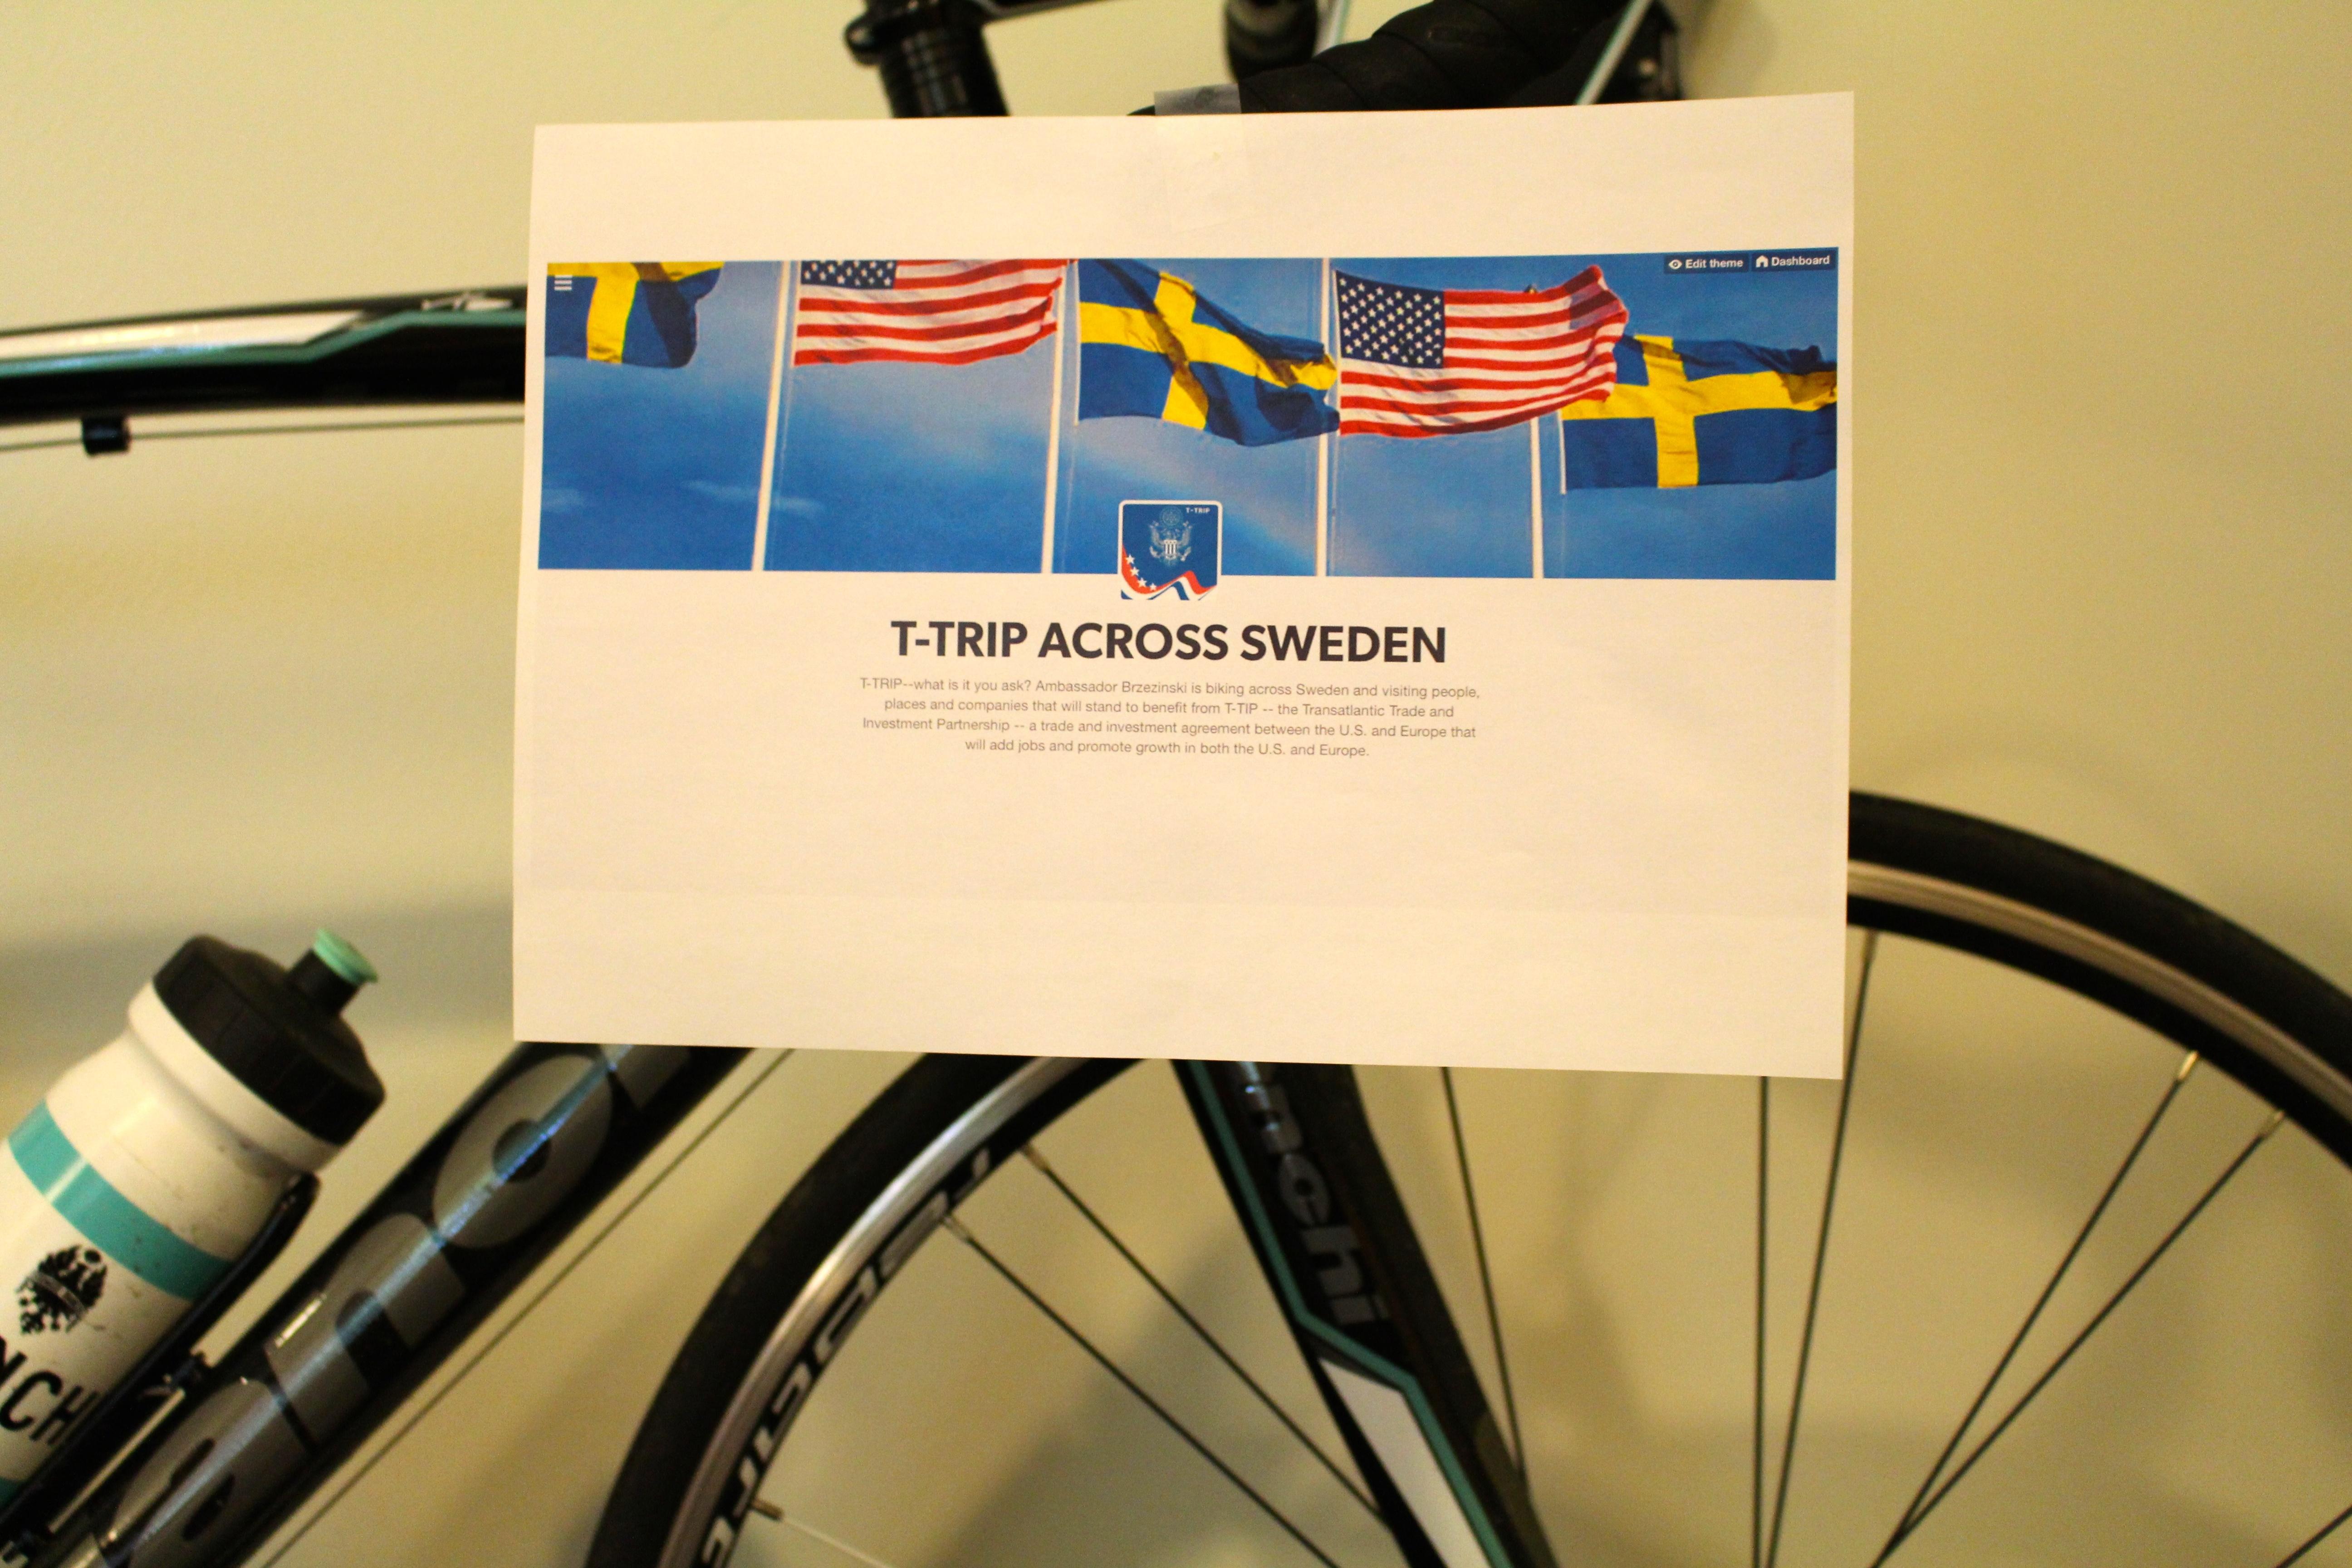 File:US embassy, Sweden (14464315190) jpg - Wikimedia Commons